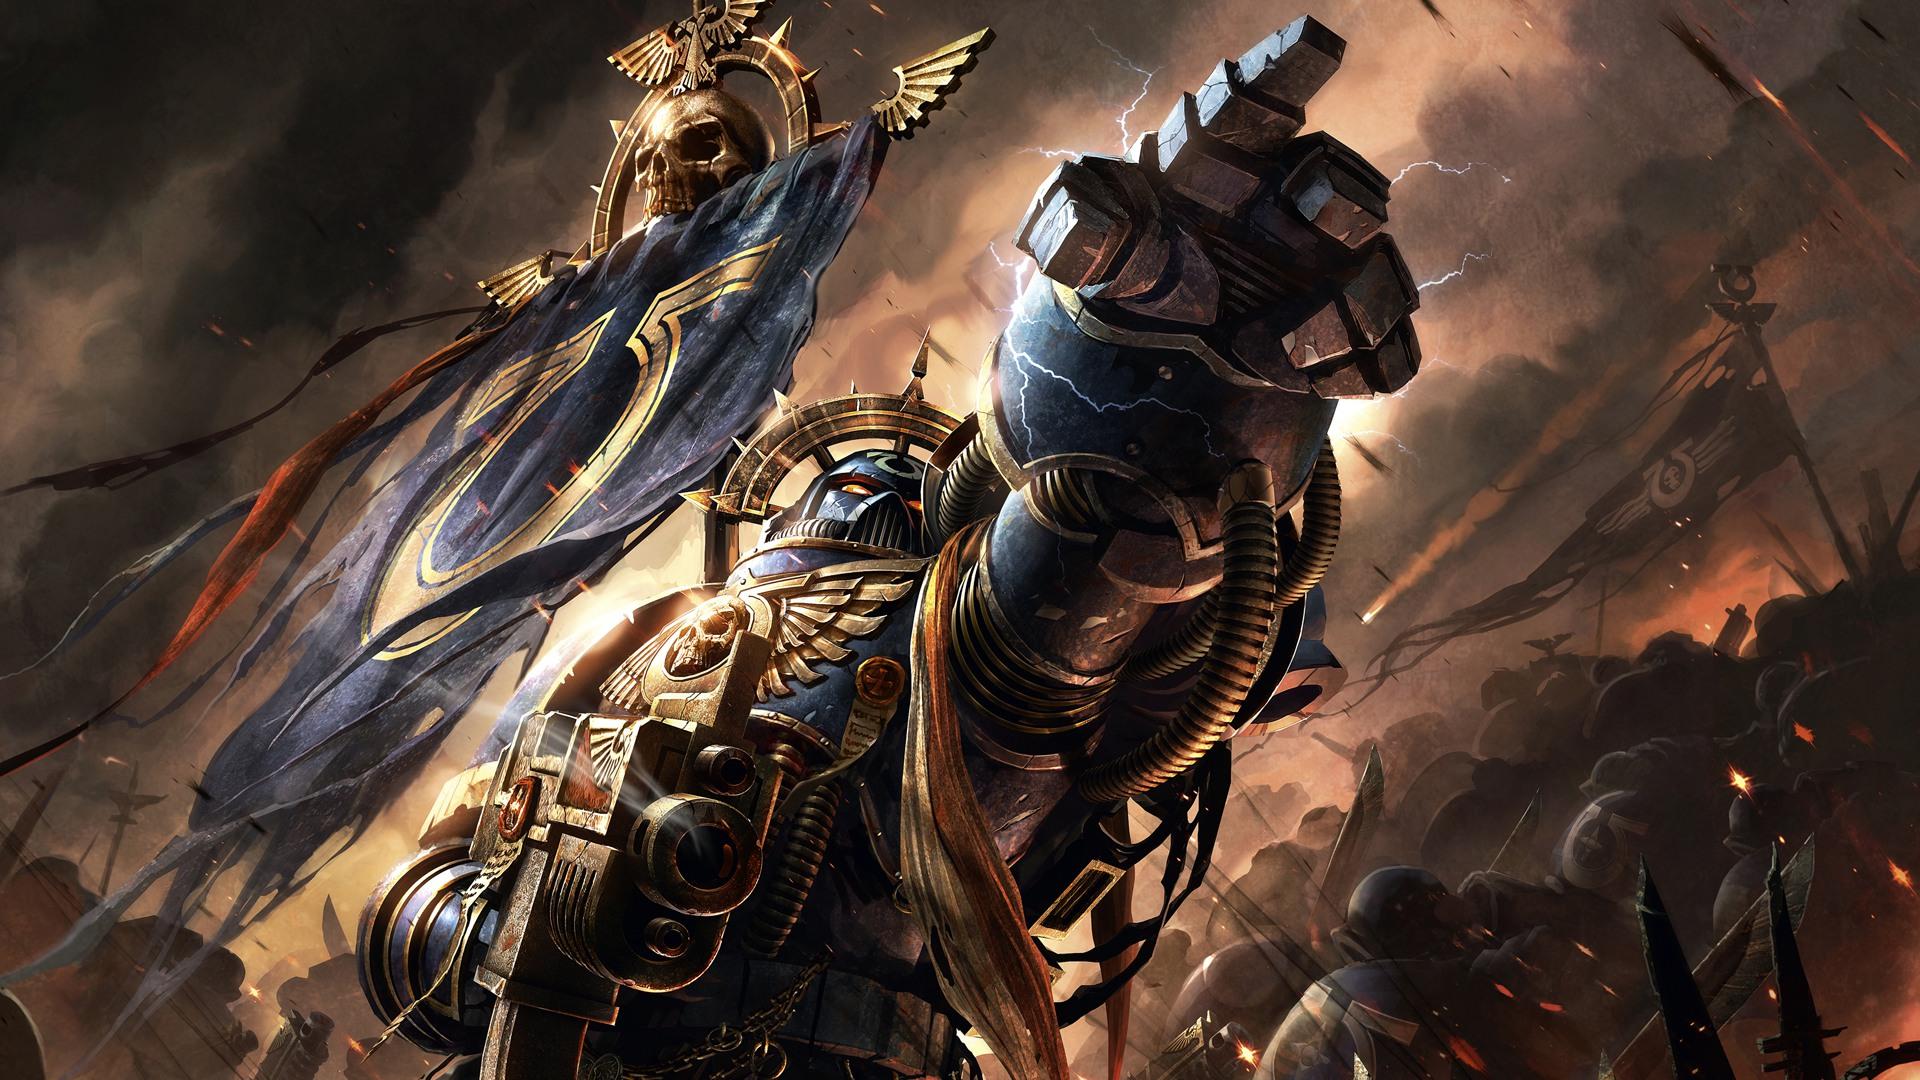 Best Buy Military Discount >> Warhammer 40,000: Dawn of War III